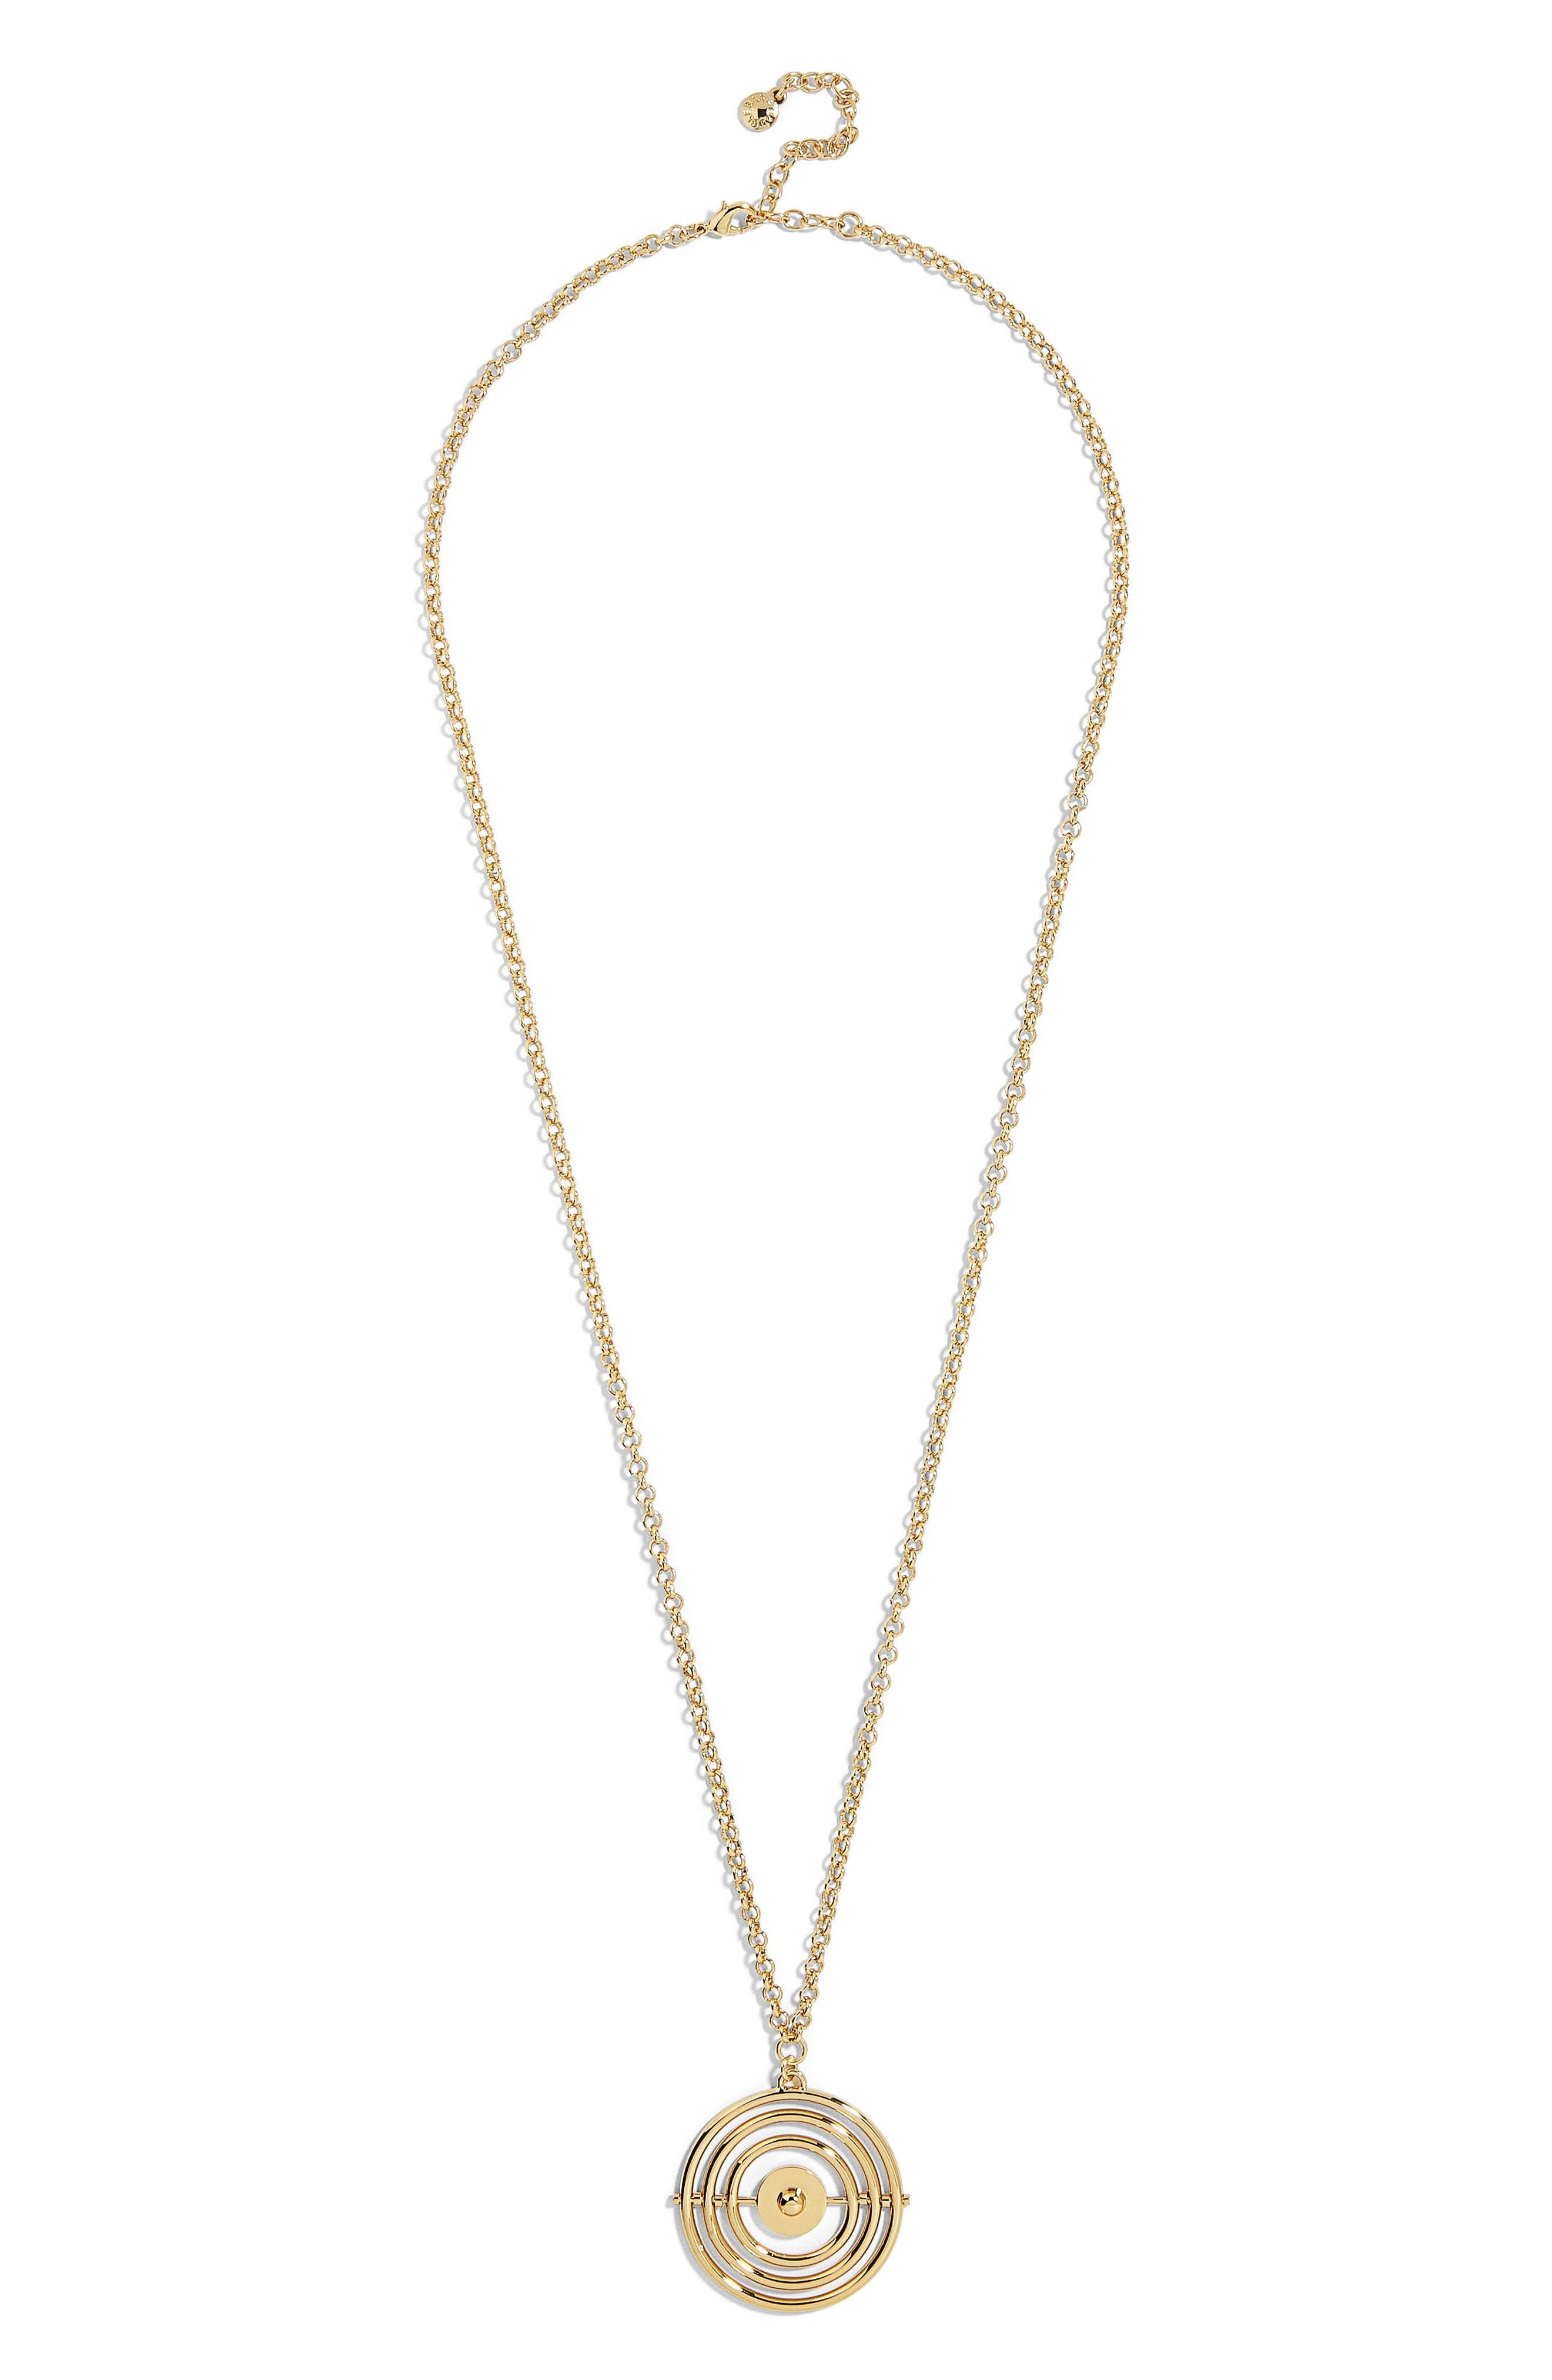 BaubleBar Royelle Large Target Pendant Necklace